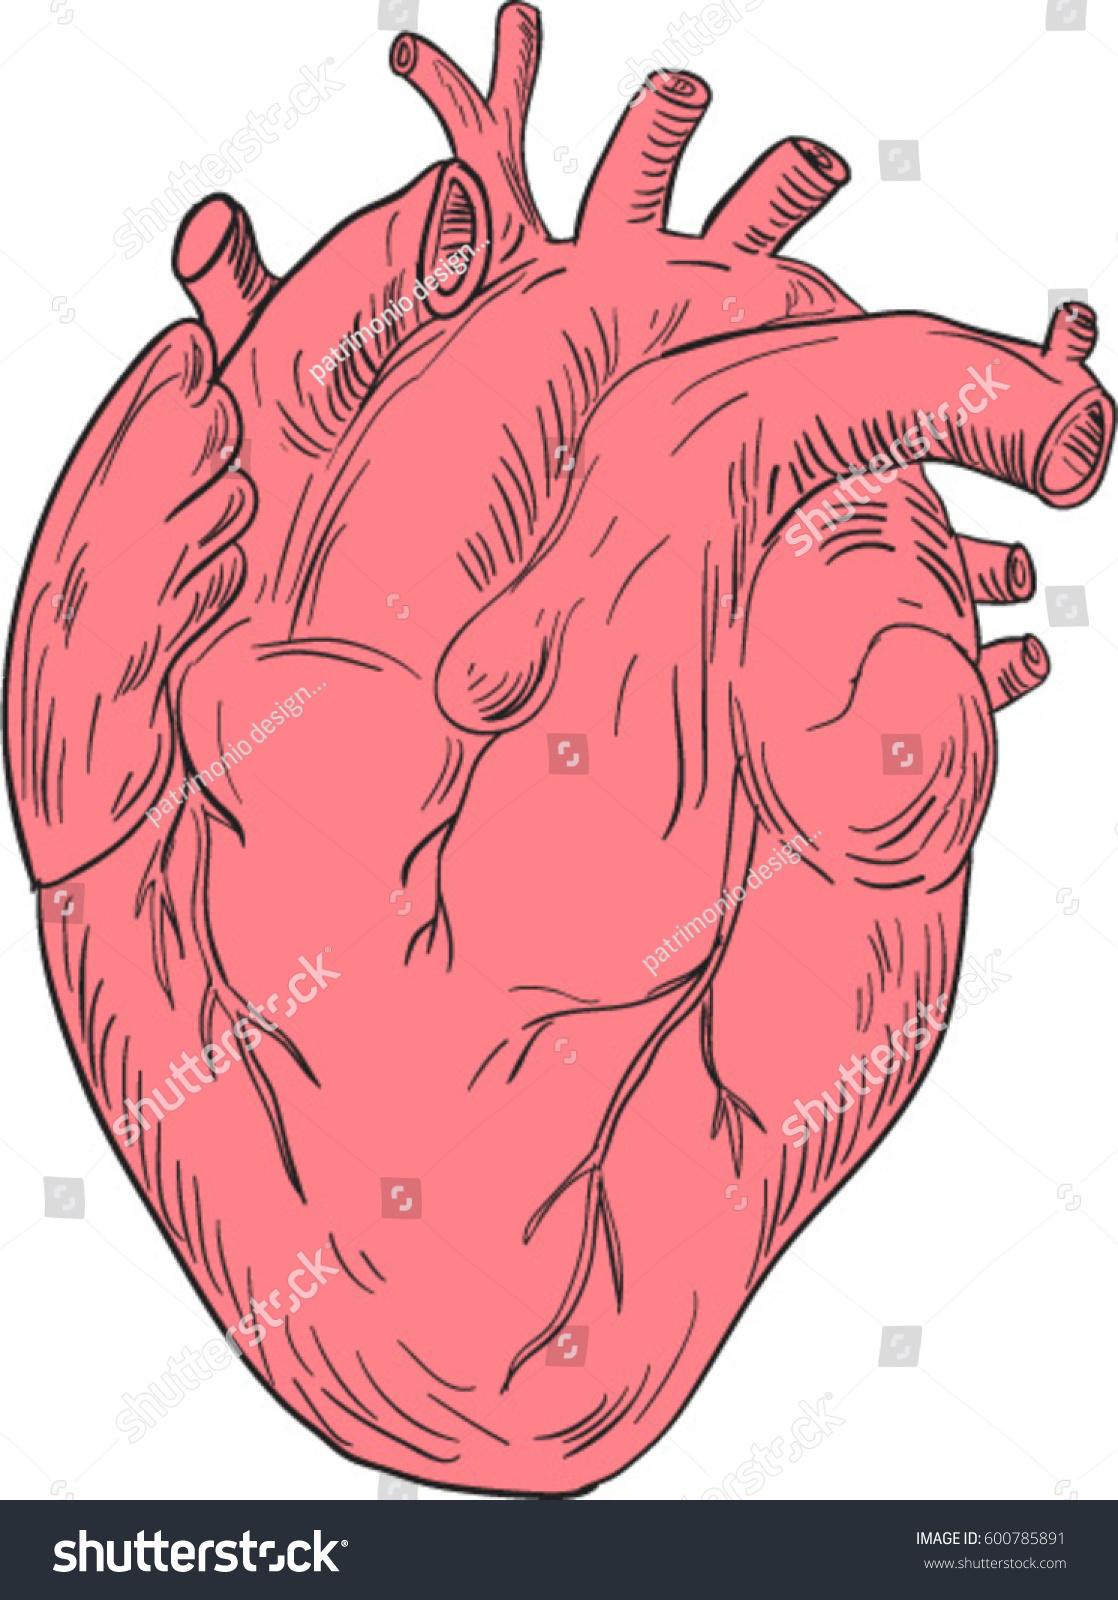 Drawing Sketch Style Illustration Human Heart Stock Vektorgrafik